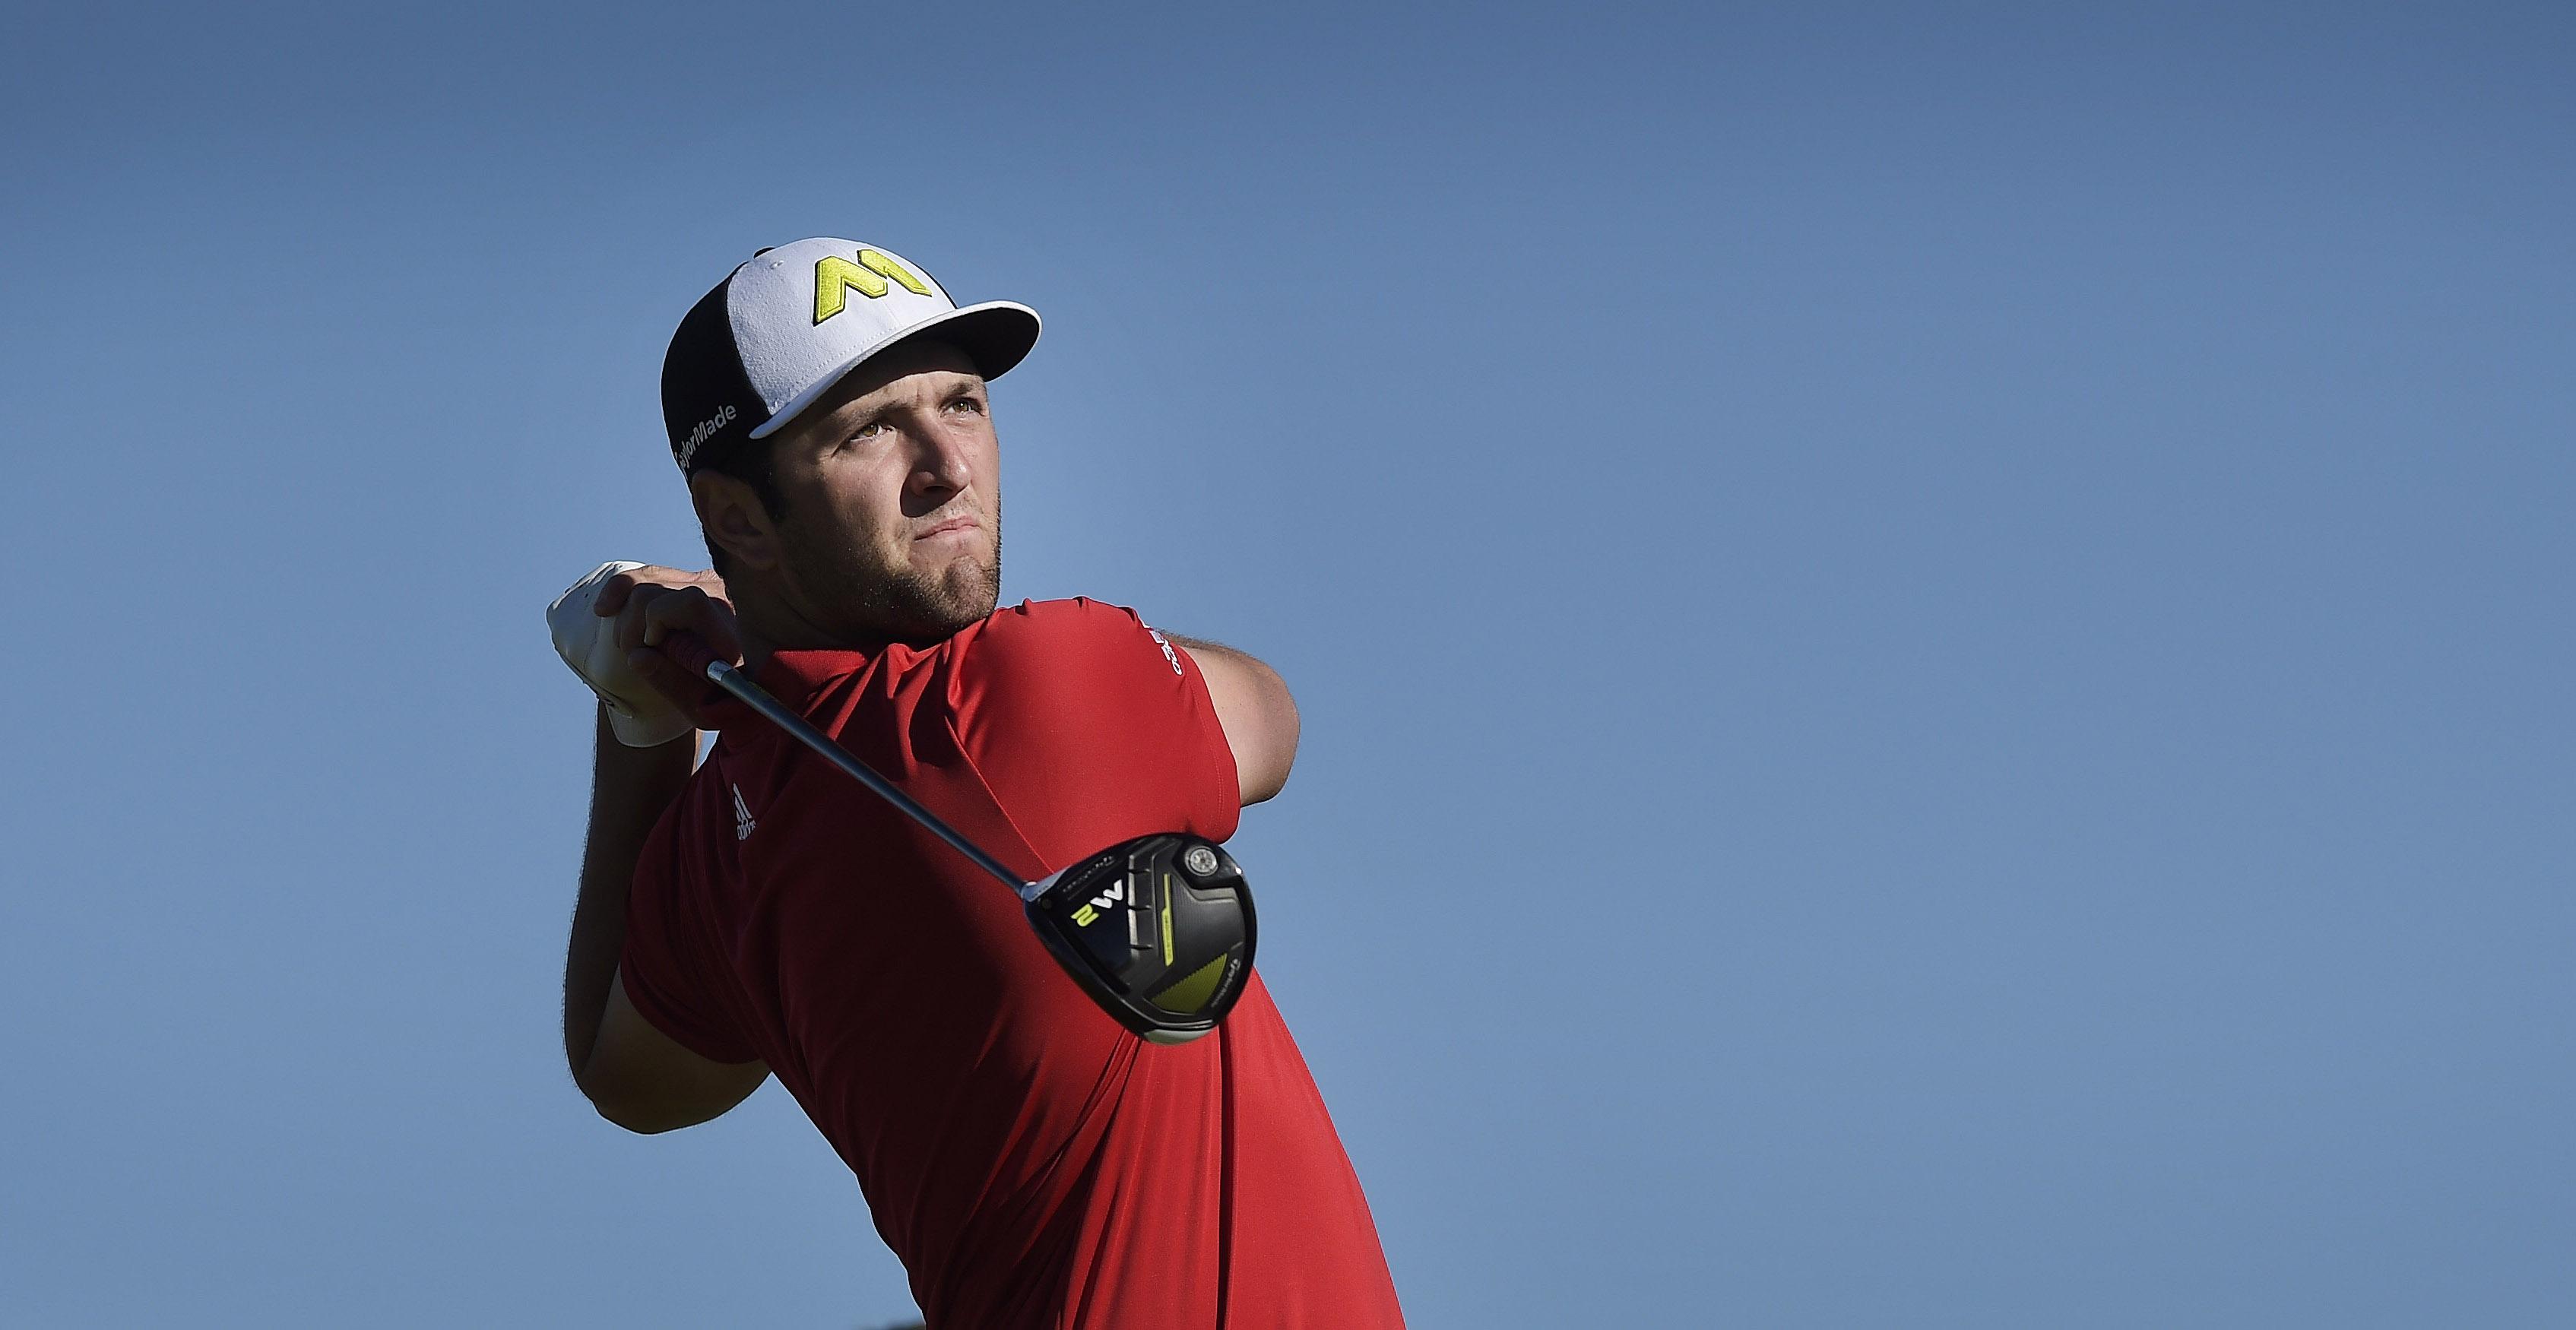 Jon Rahm won his first career PGA Tour event Sunday at the Farmers Insurance Open.